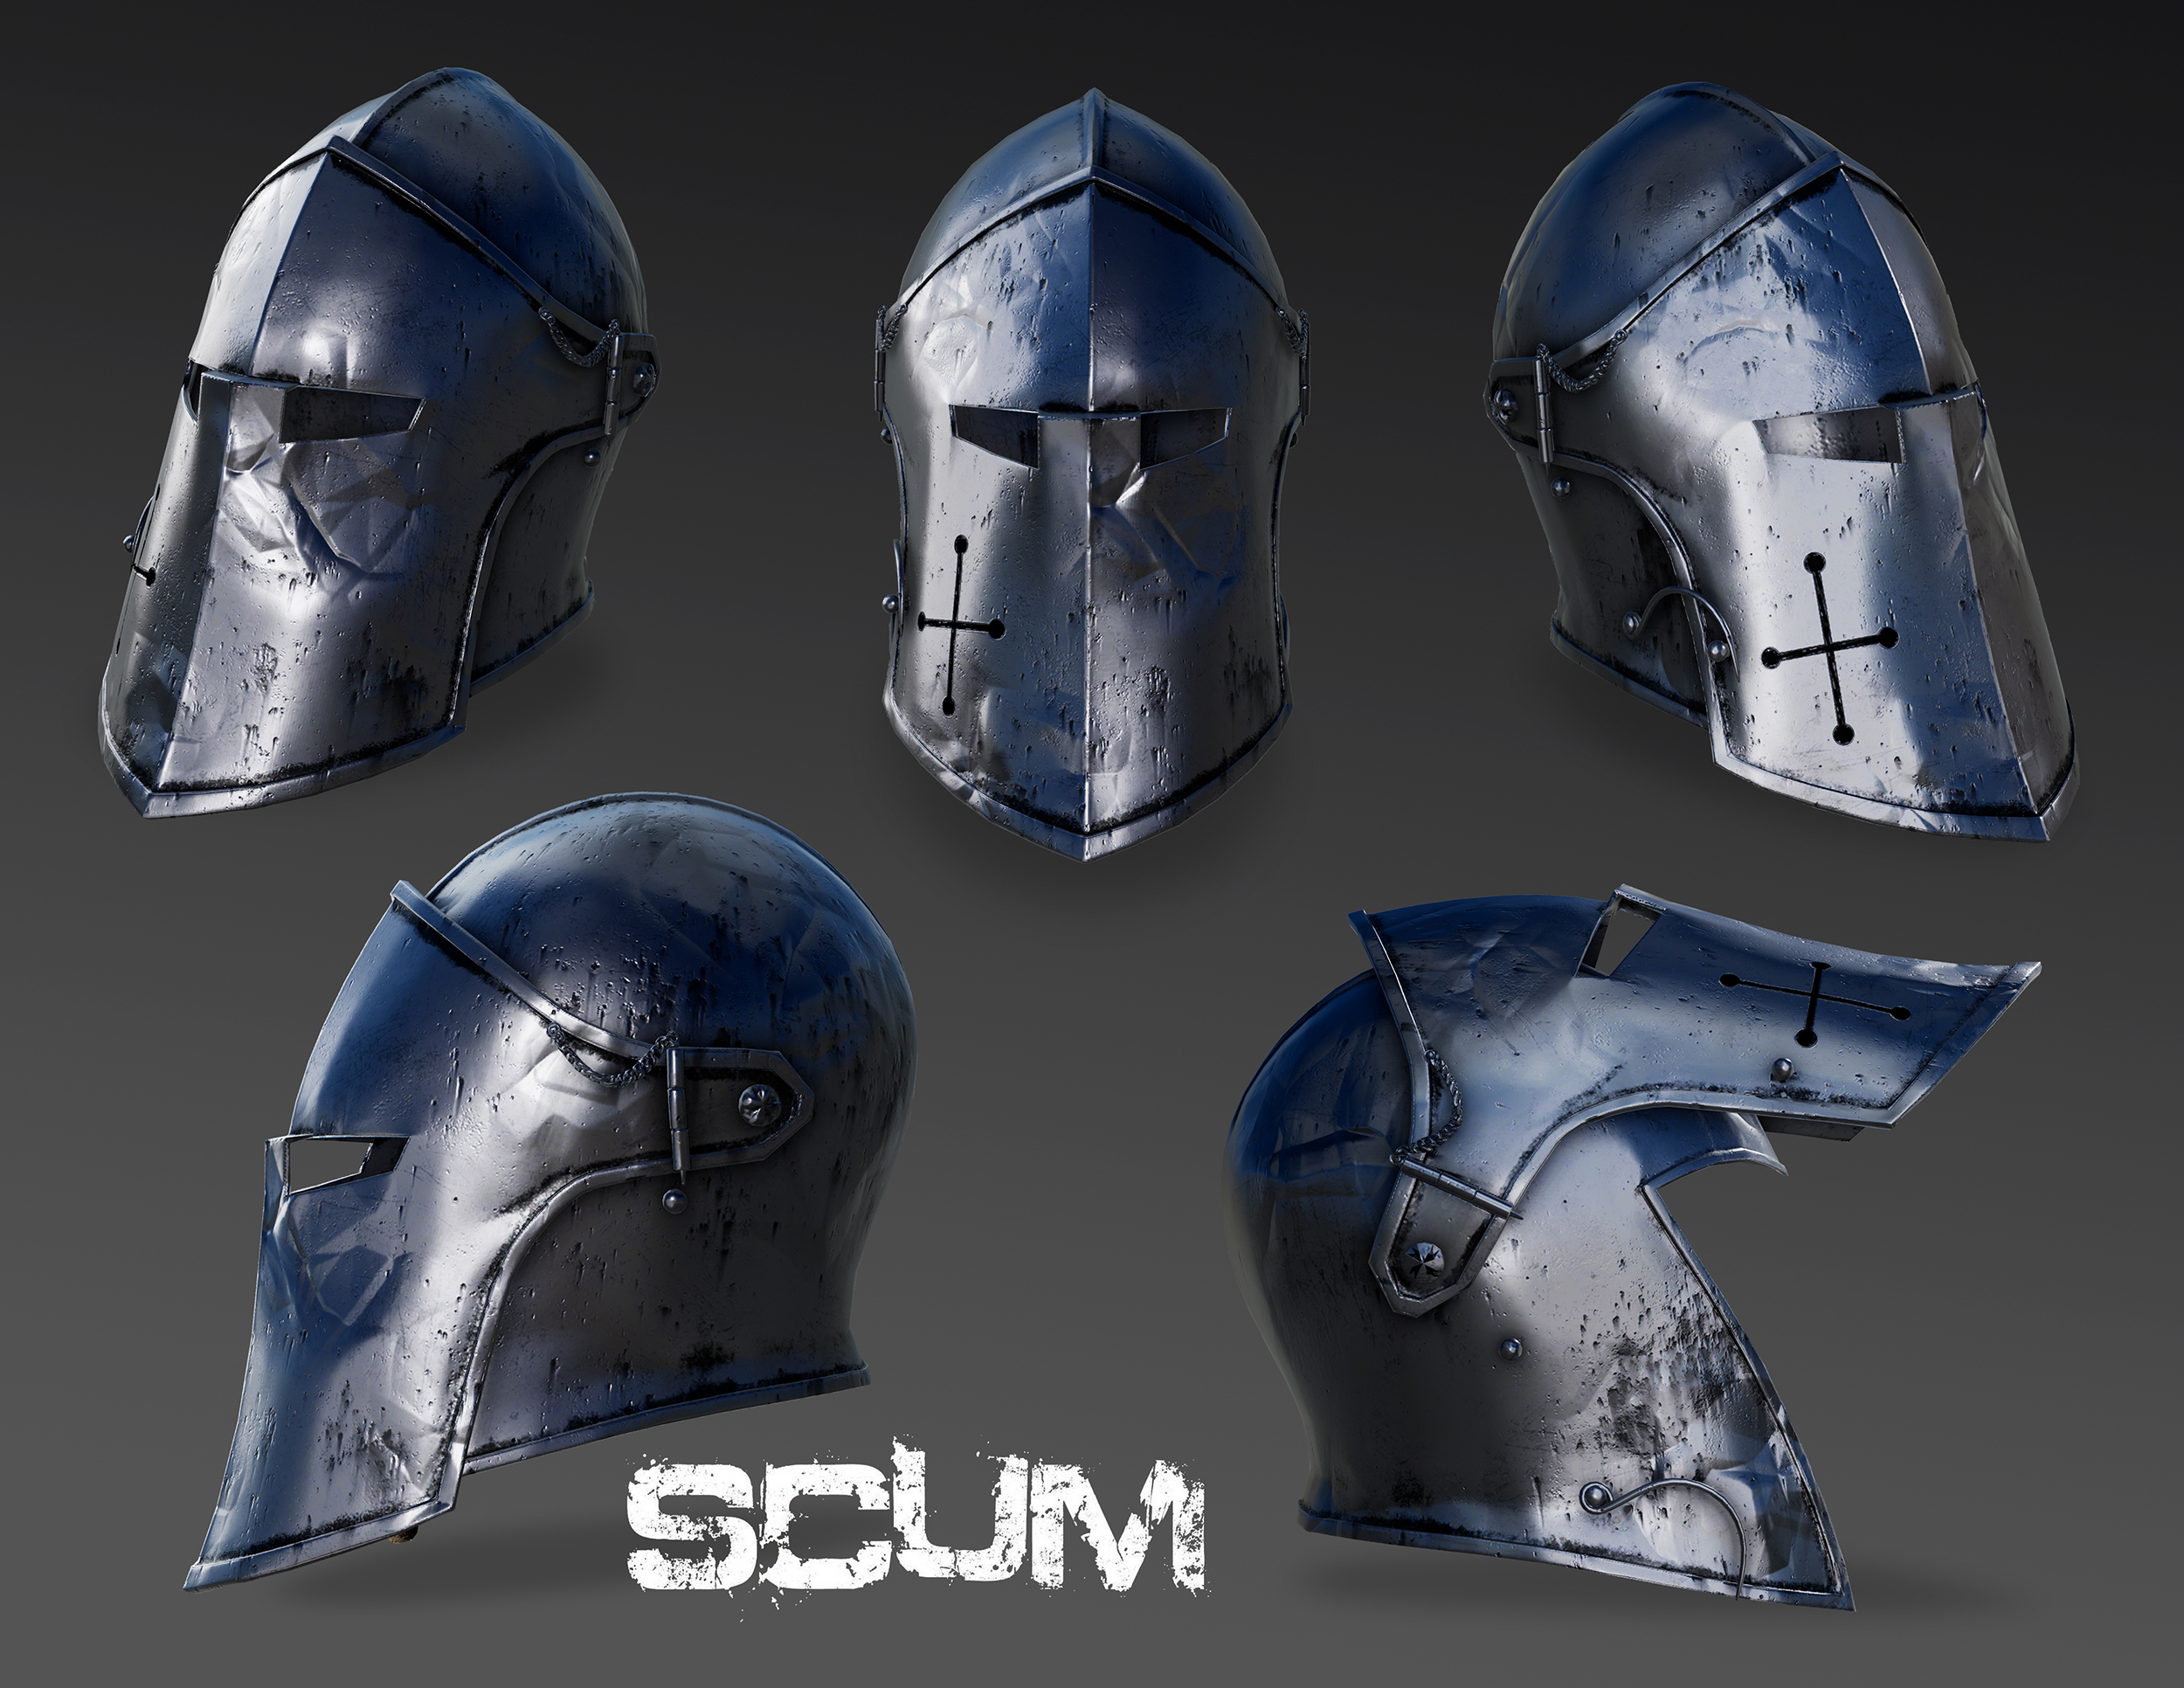 SCUM - Patch 0.5.5.33519